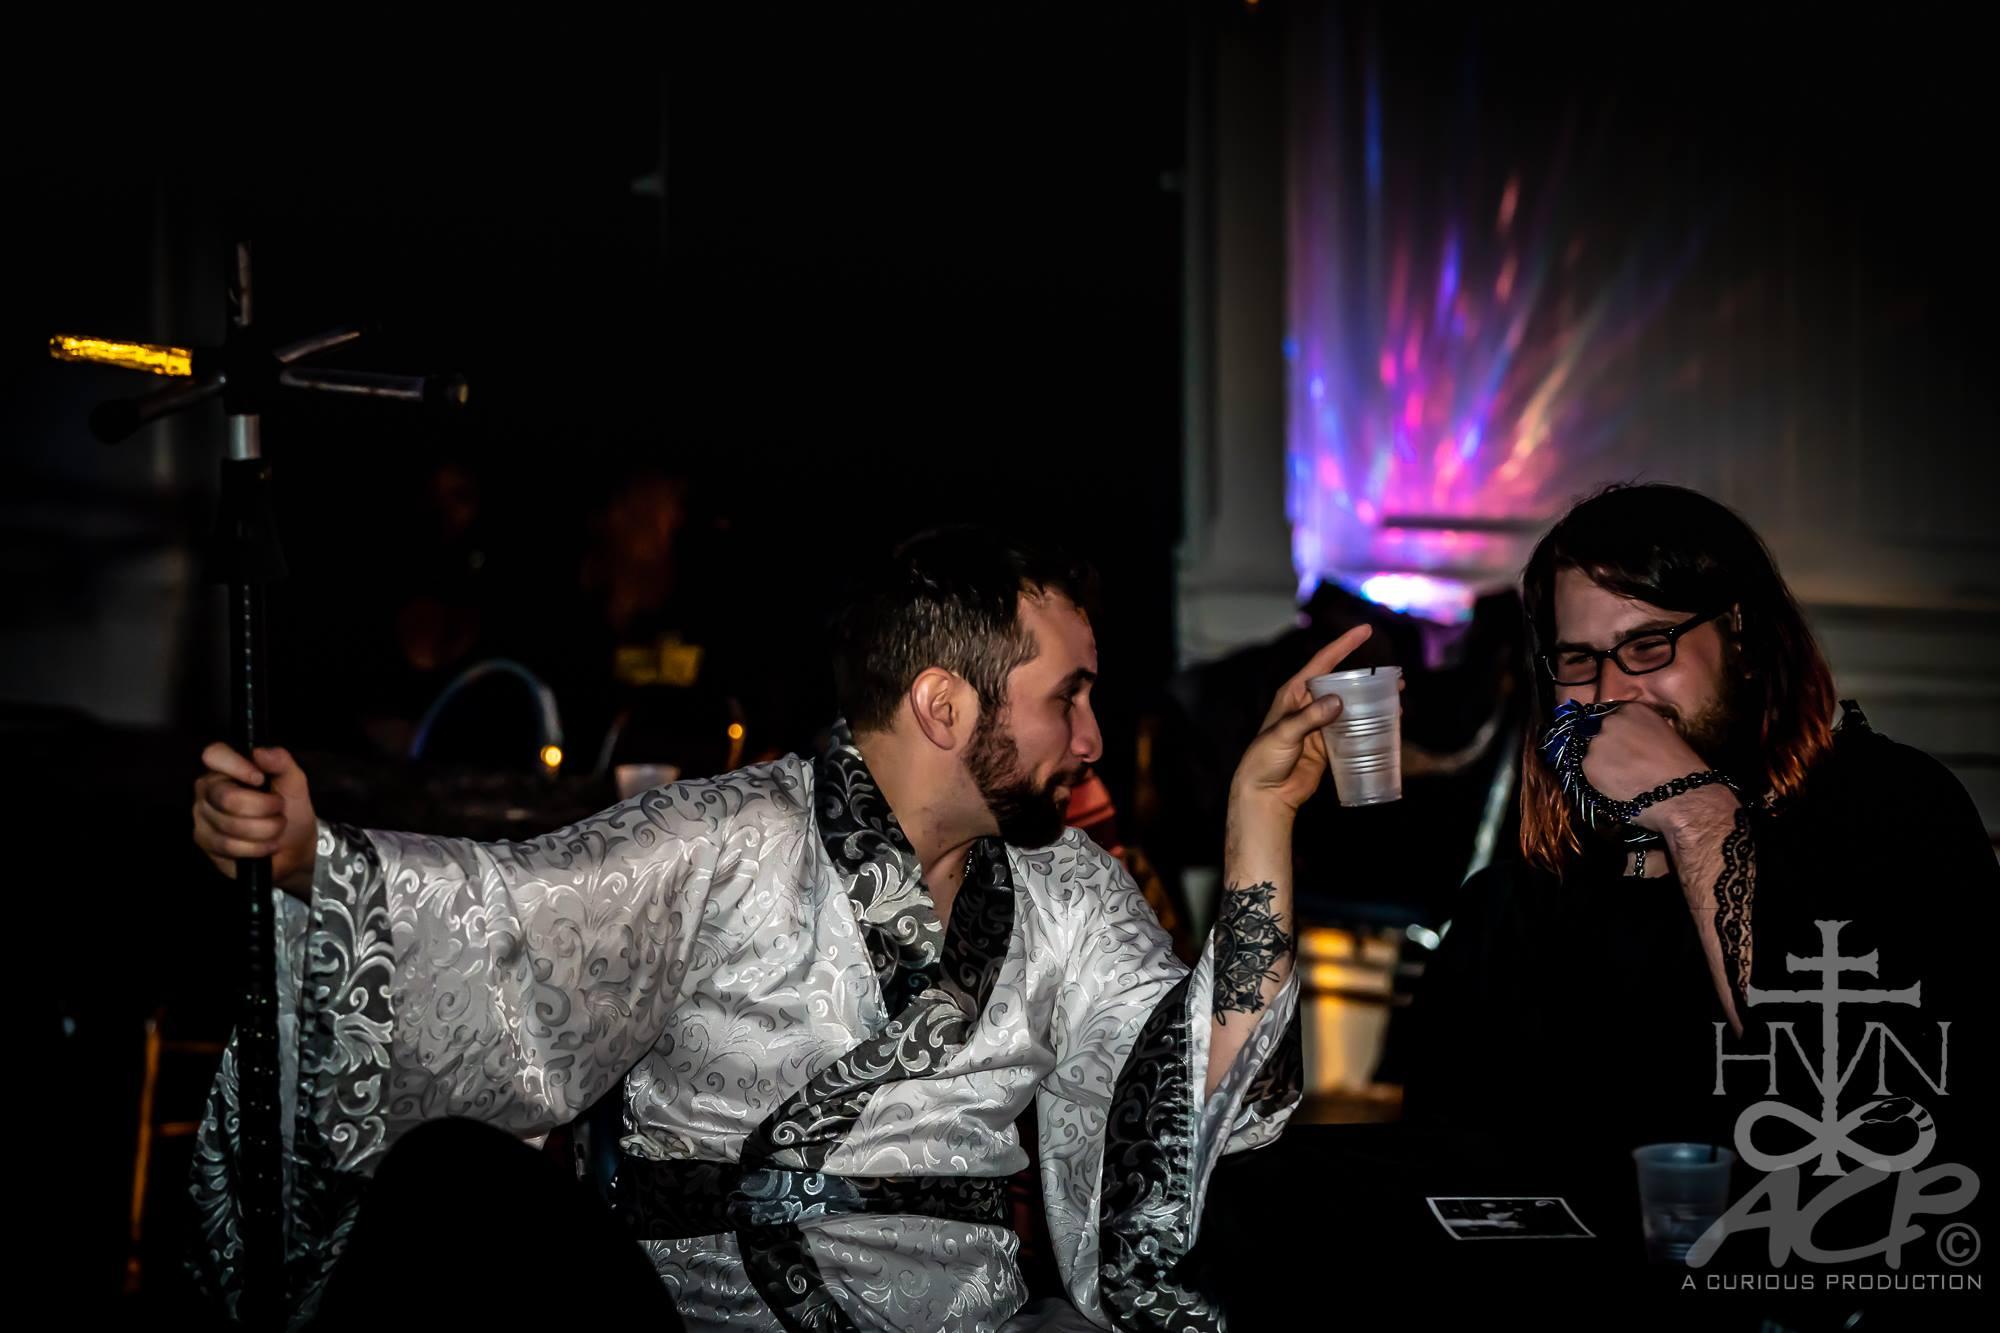 TheHavenClub-Goth-Industrial-Dance-Alternative-Northampton-MA-Exotic Erotic 2018 (61).jpg